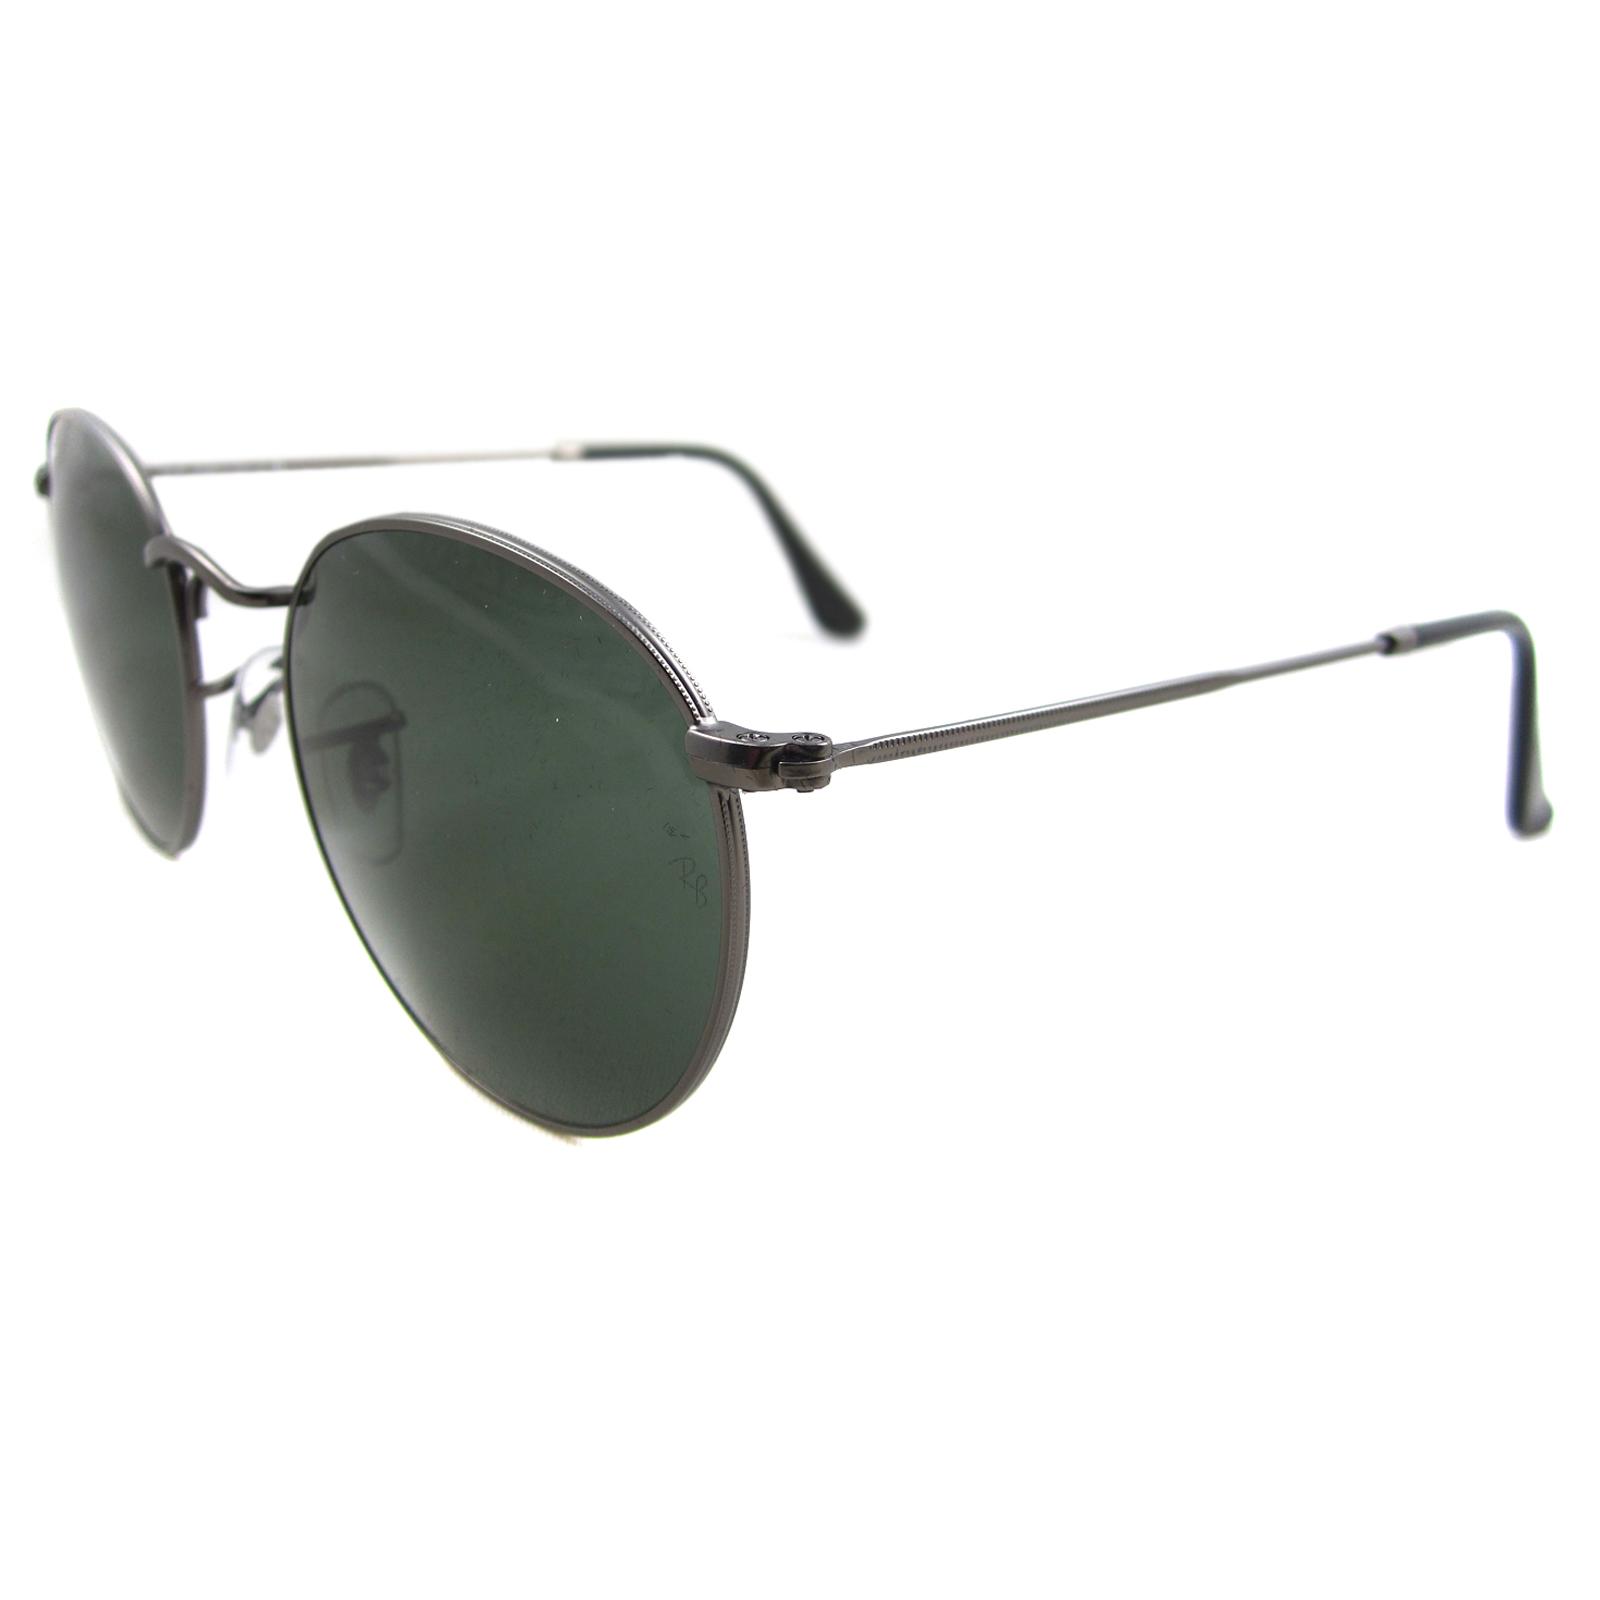 Sentinel Ray-Ban Sunglasses Round Metal 3447 029 Gunmetal Green Medium 50mm 367ed8bfcf